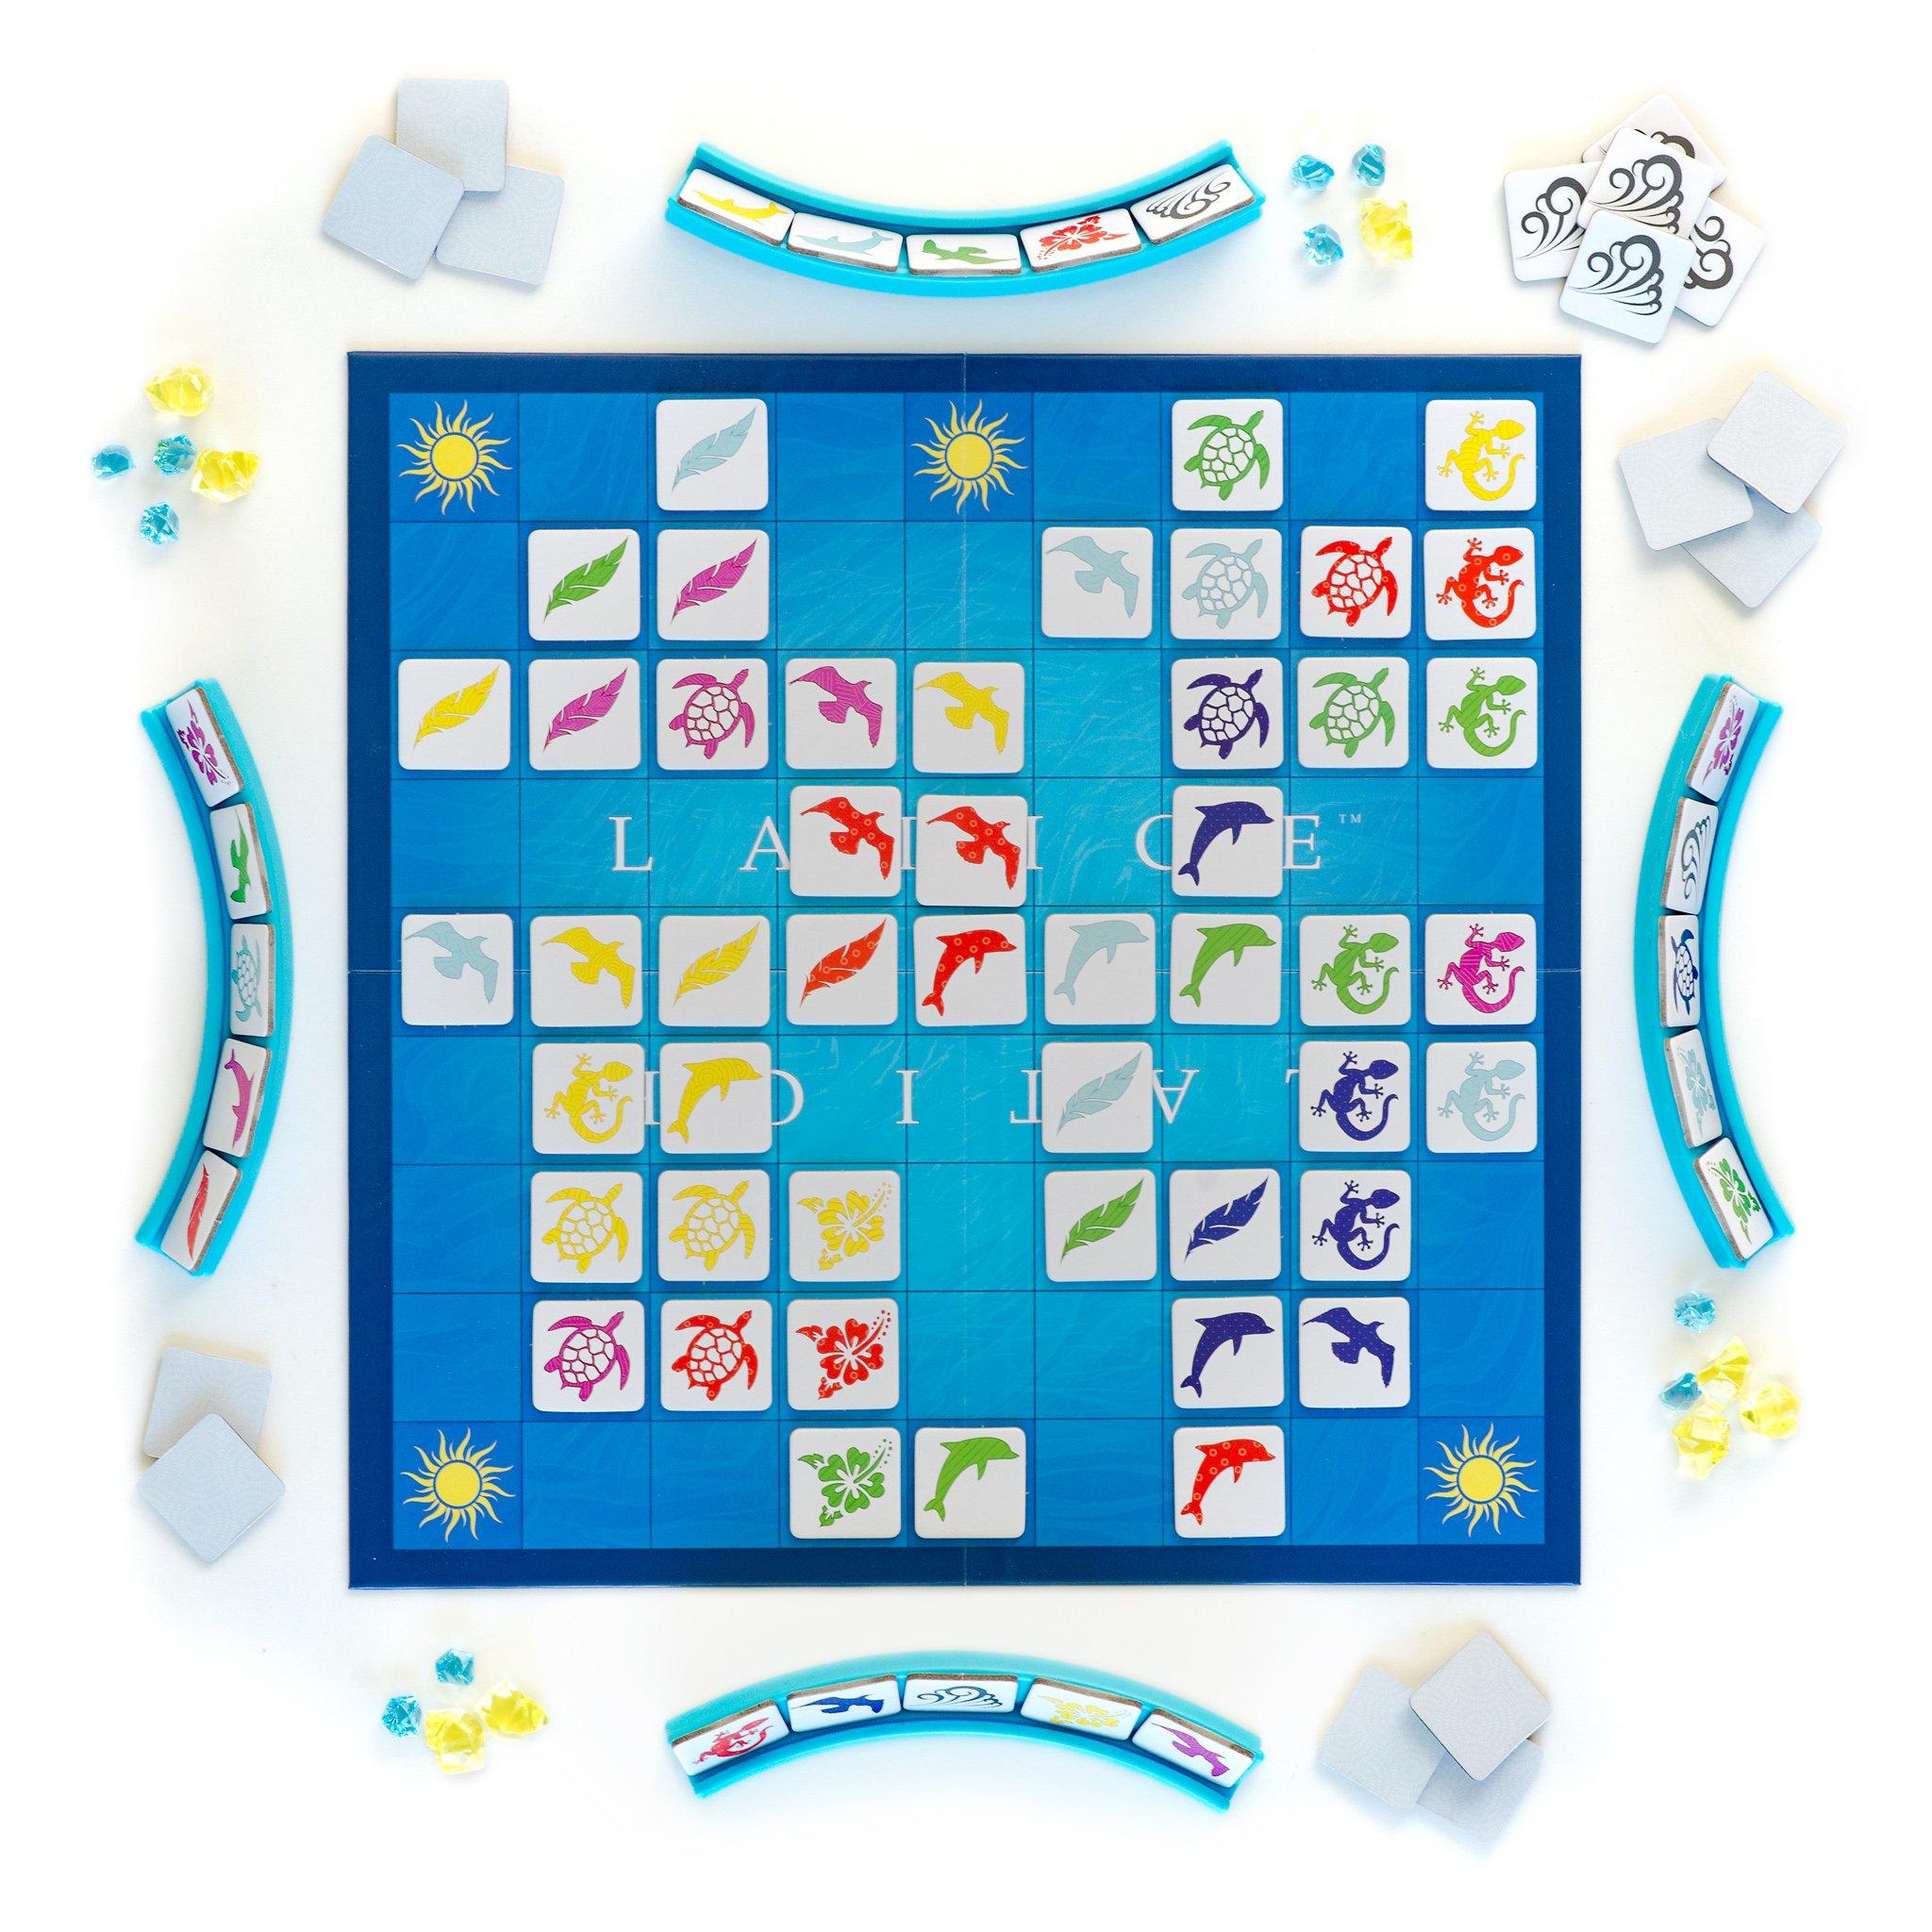 Latice - Brettspiel